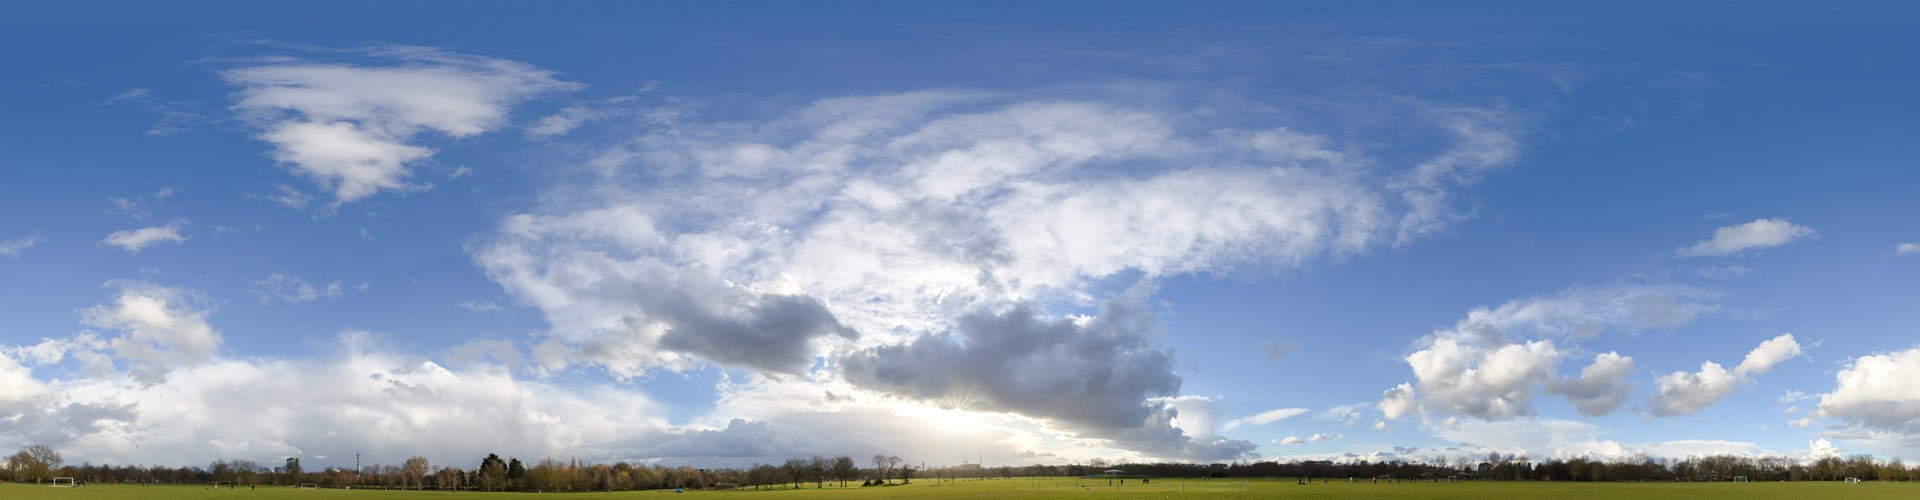 Rainy Clouds 3197 (30k) HDRI